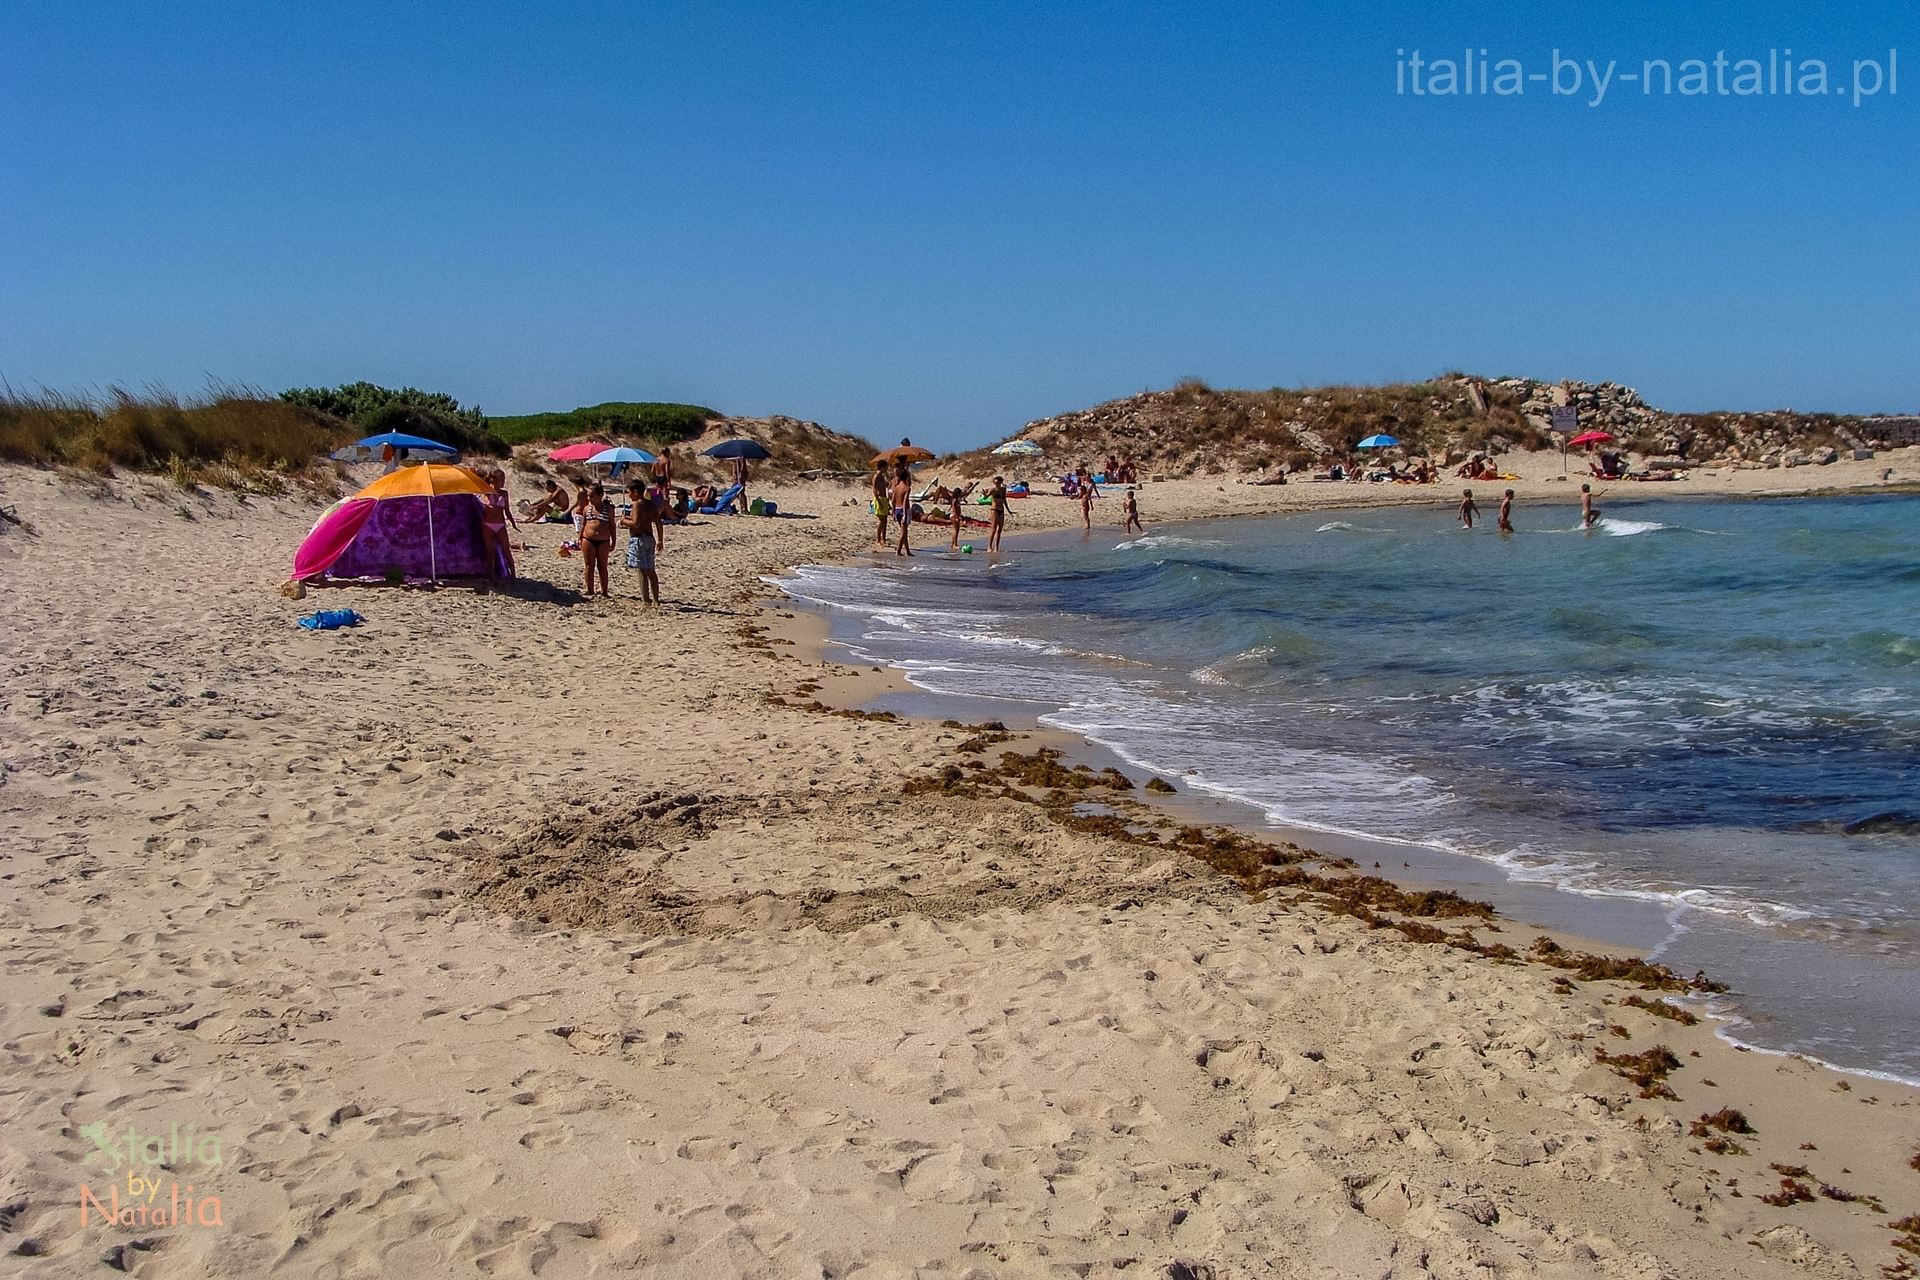 Torre Guaceto plaża Apulia wrzesień